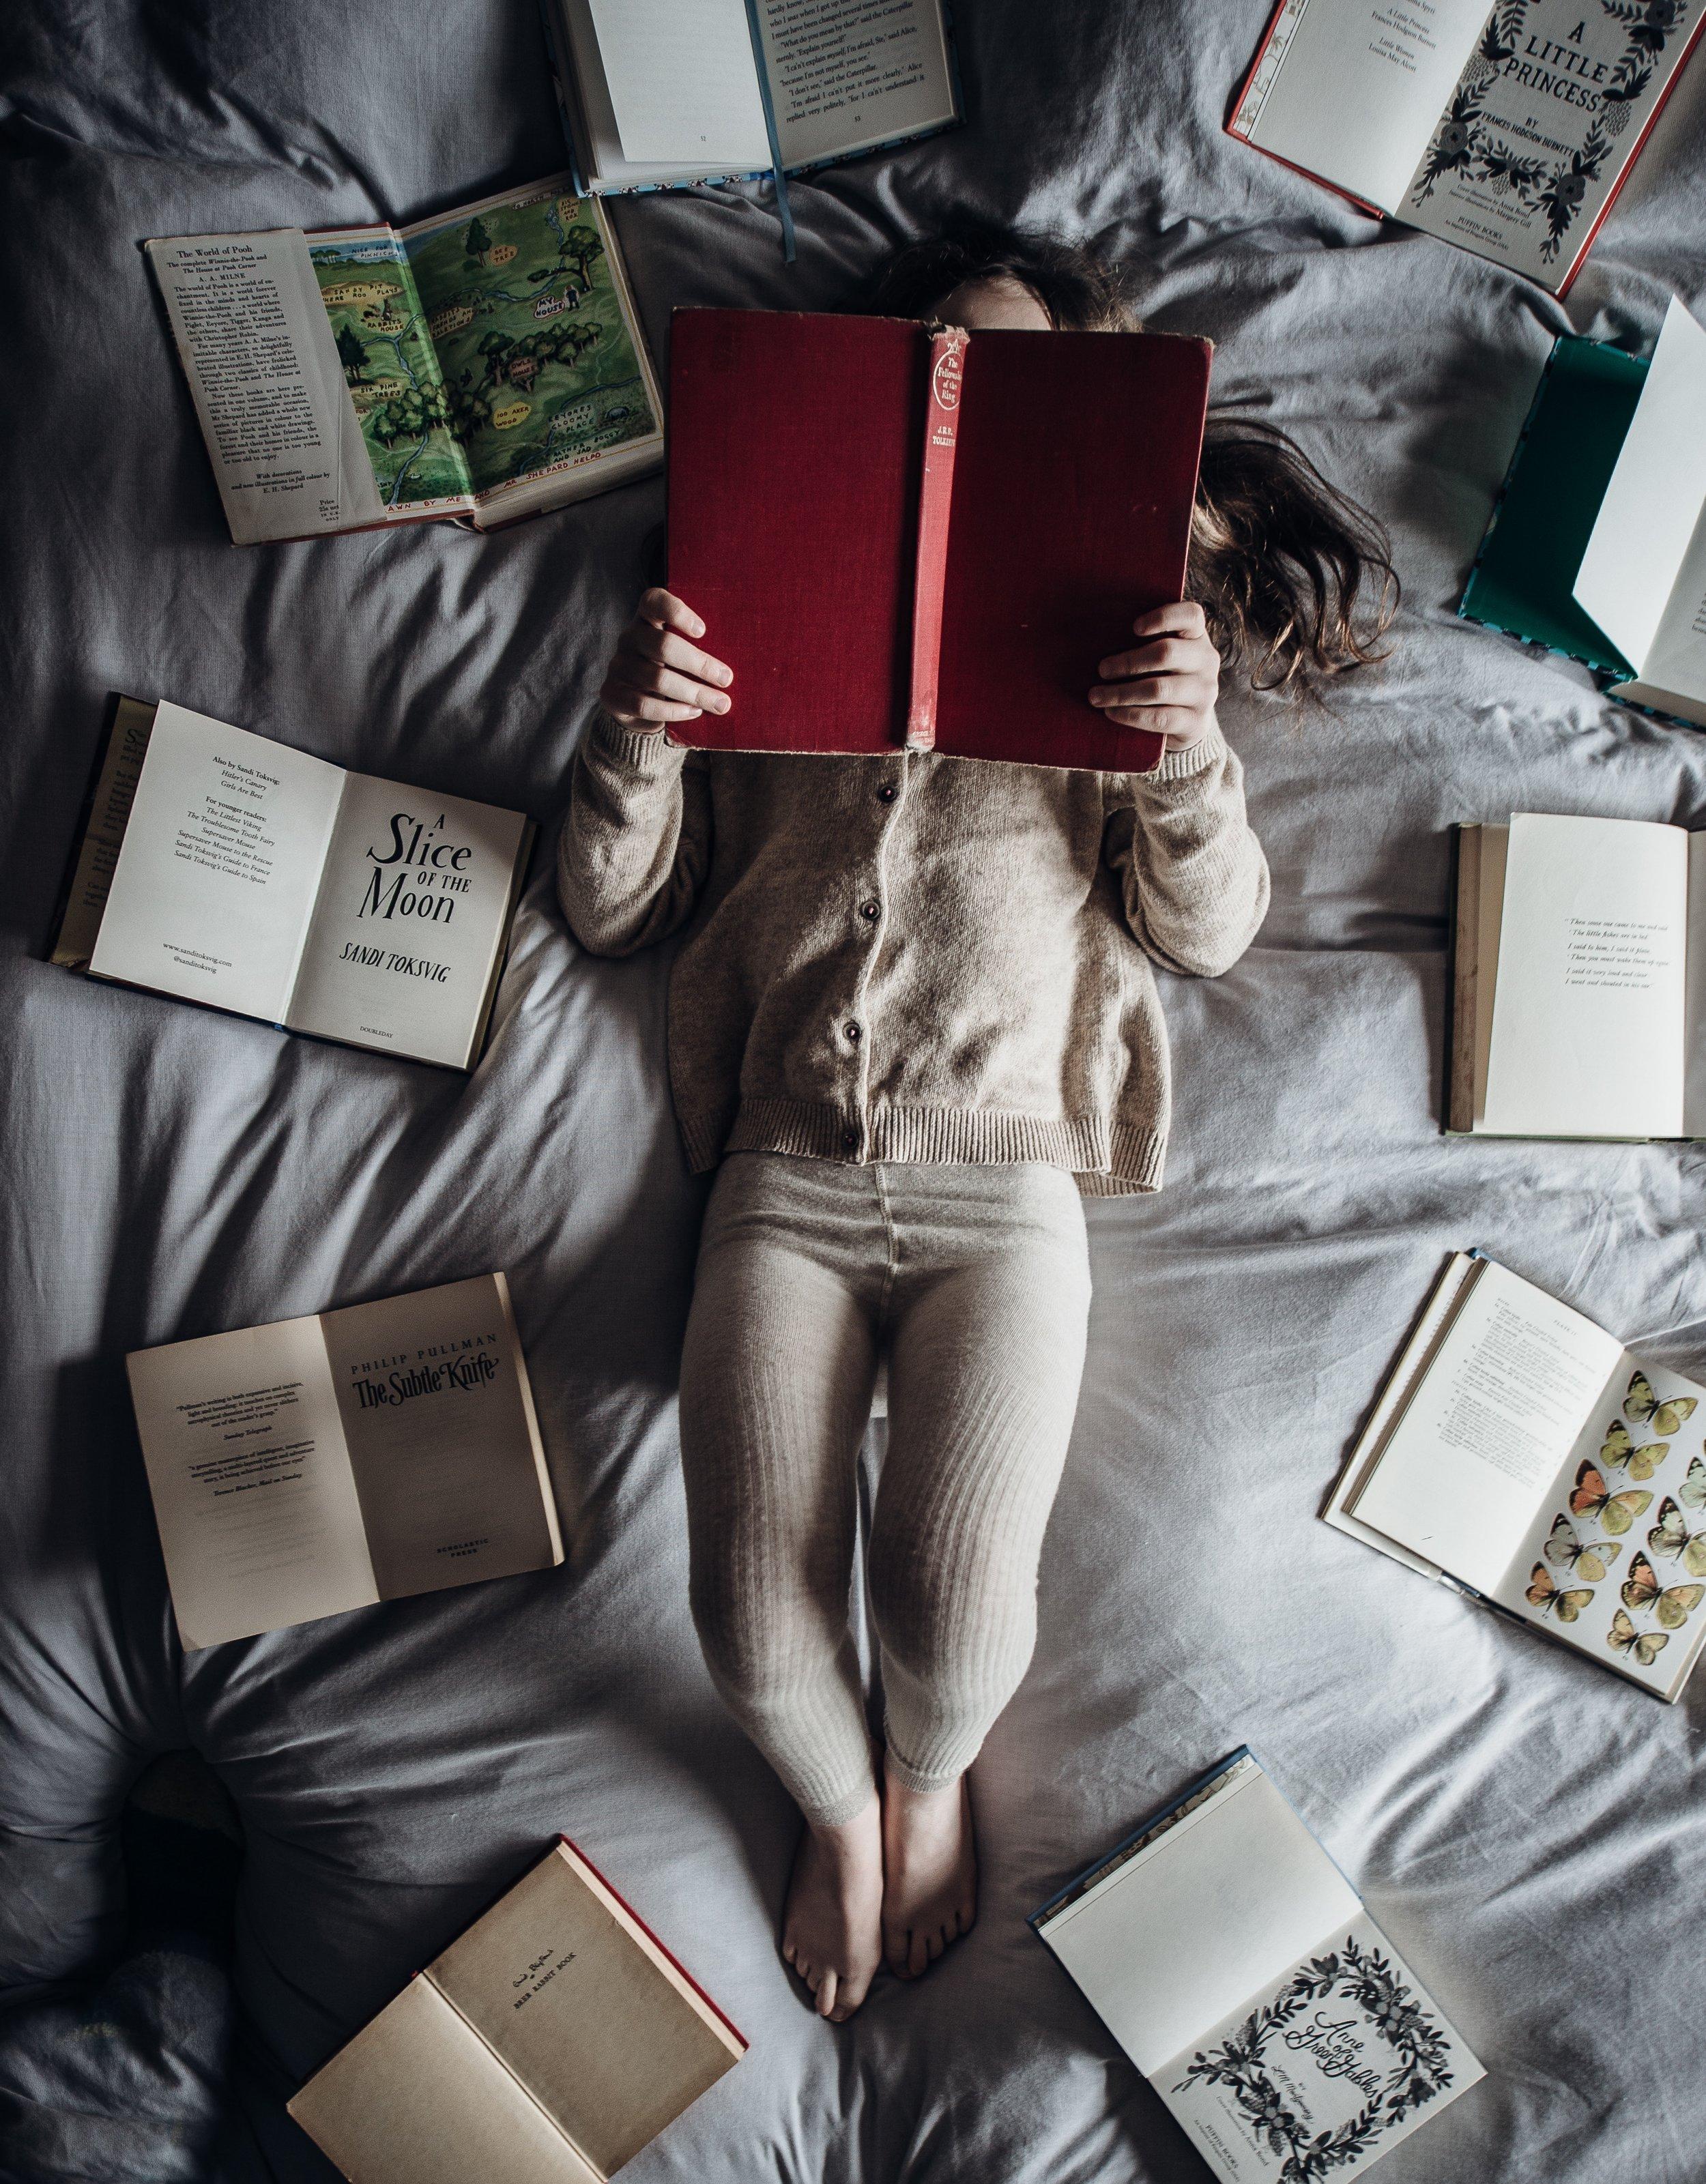 Girls Summer Reading List